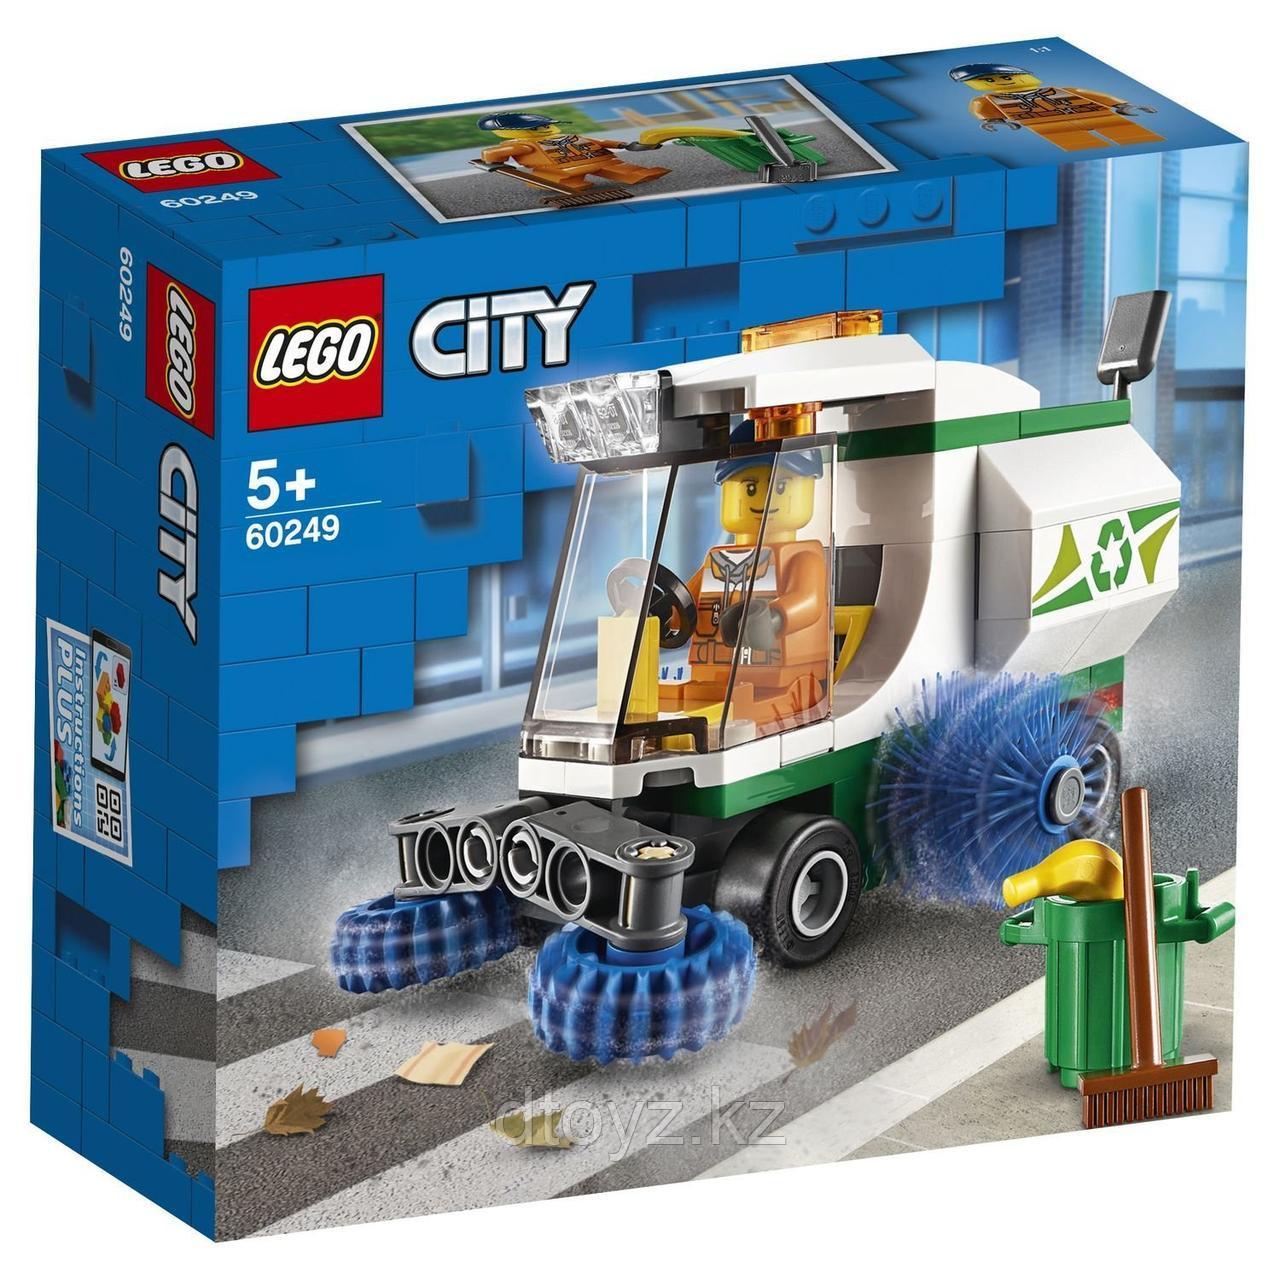 Lego City 60249 Машина для очистки улиц